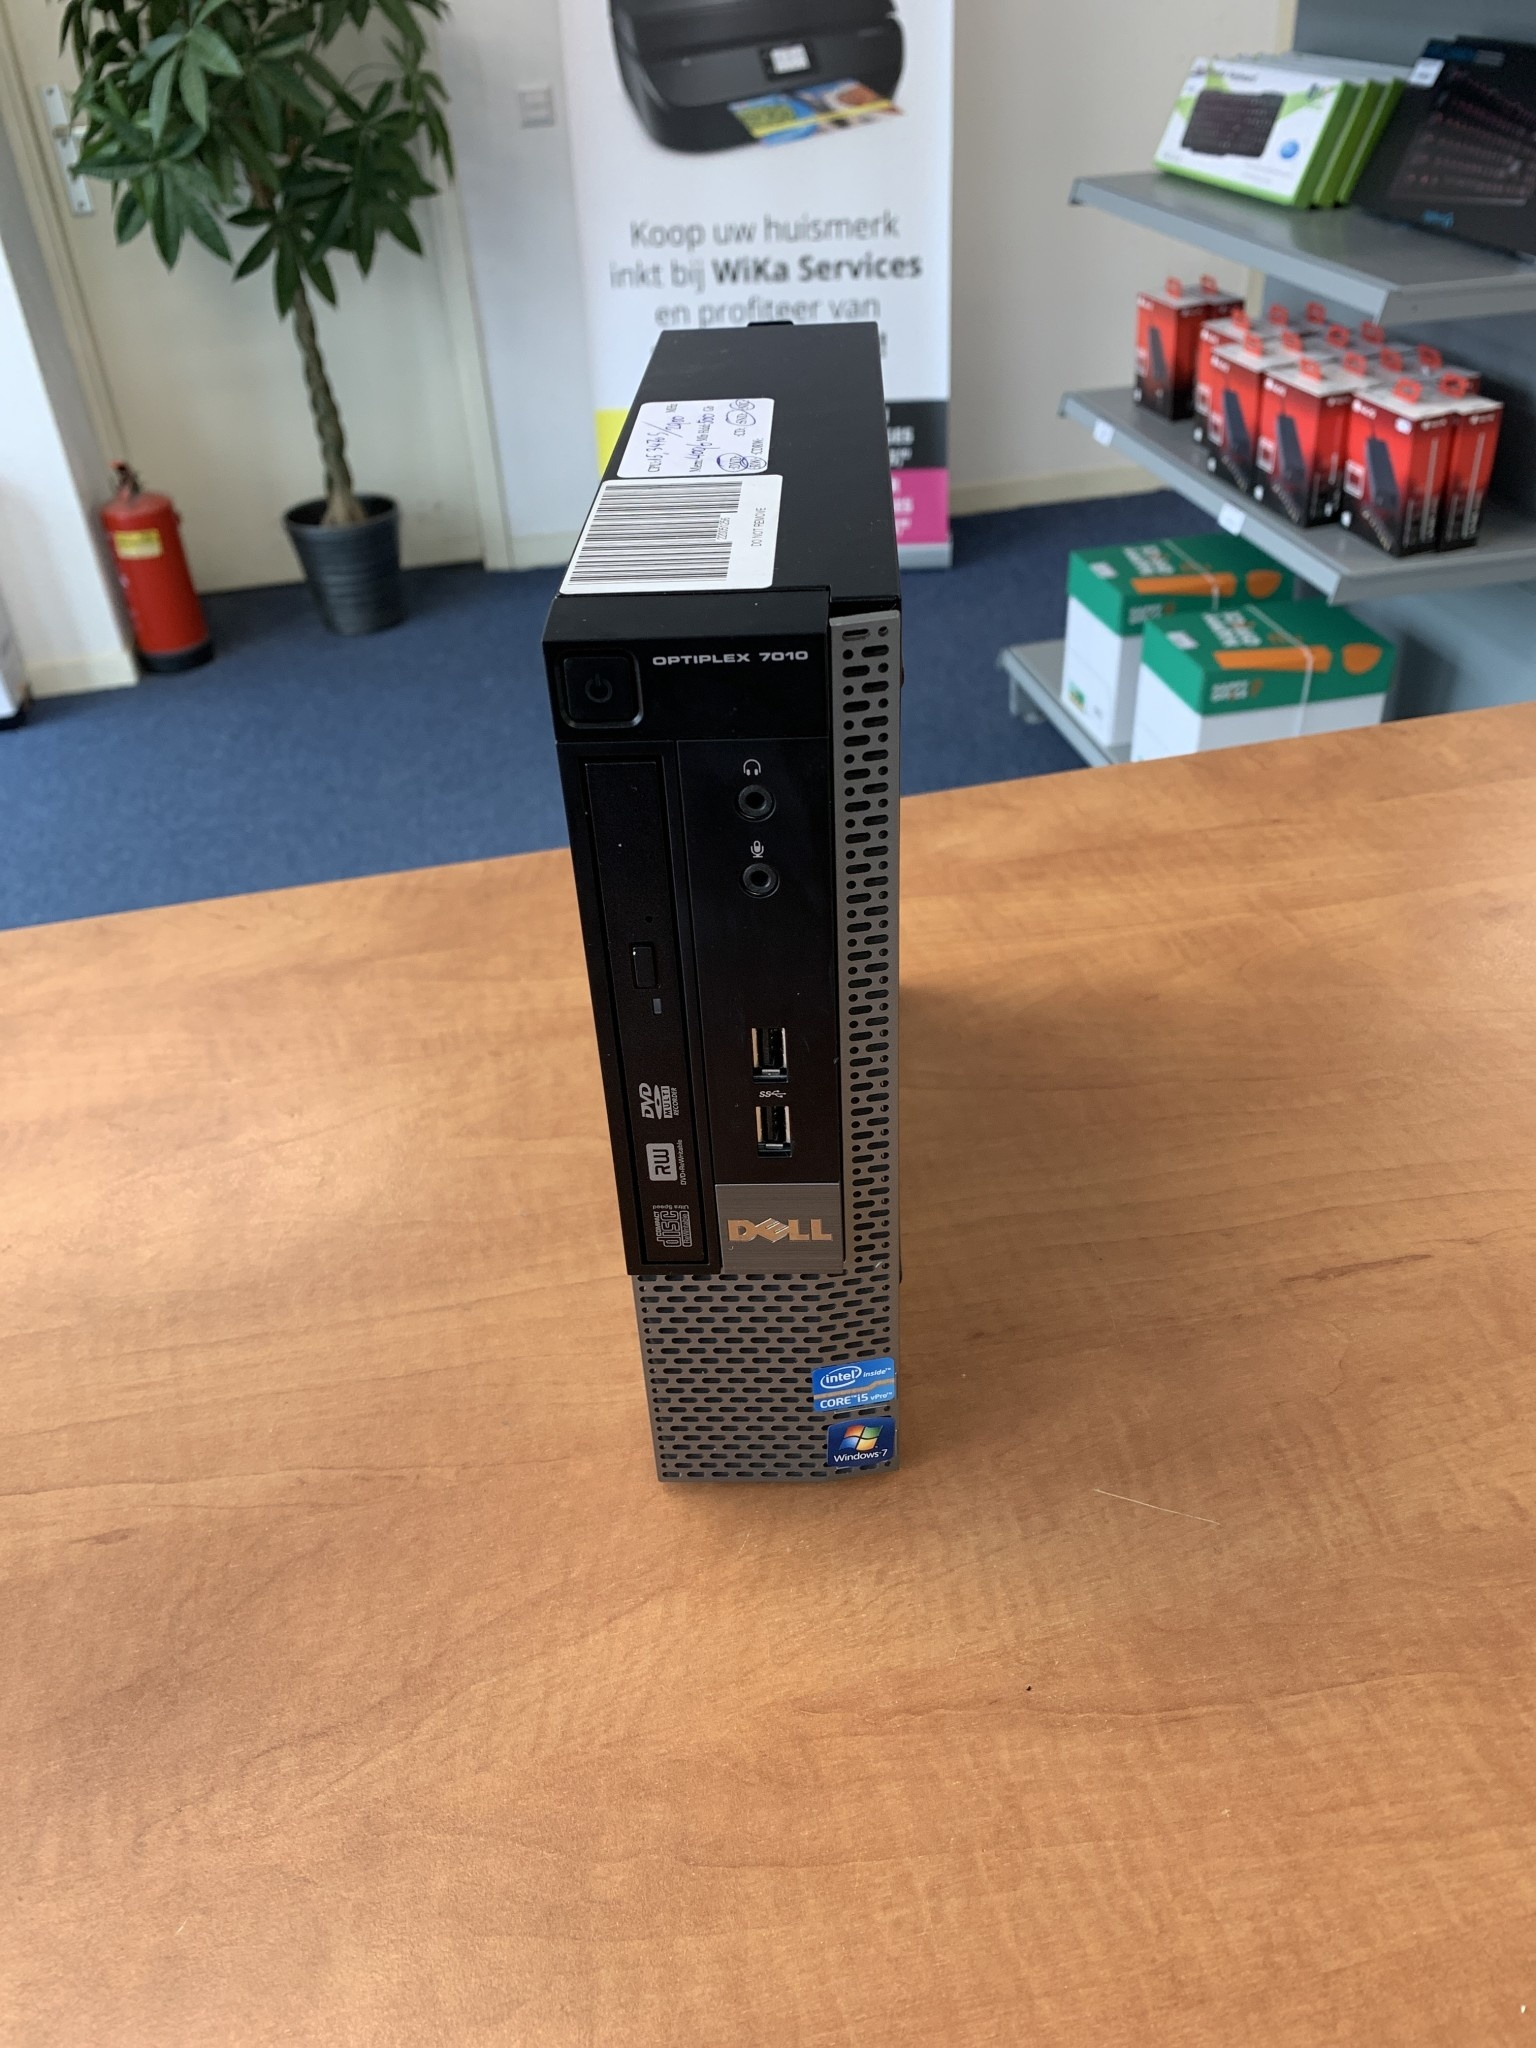 Dell Optiplex 7010 i5-3475S 4GB 256Gb SSD Windows 10 Pro used PC